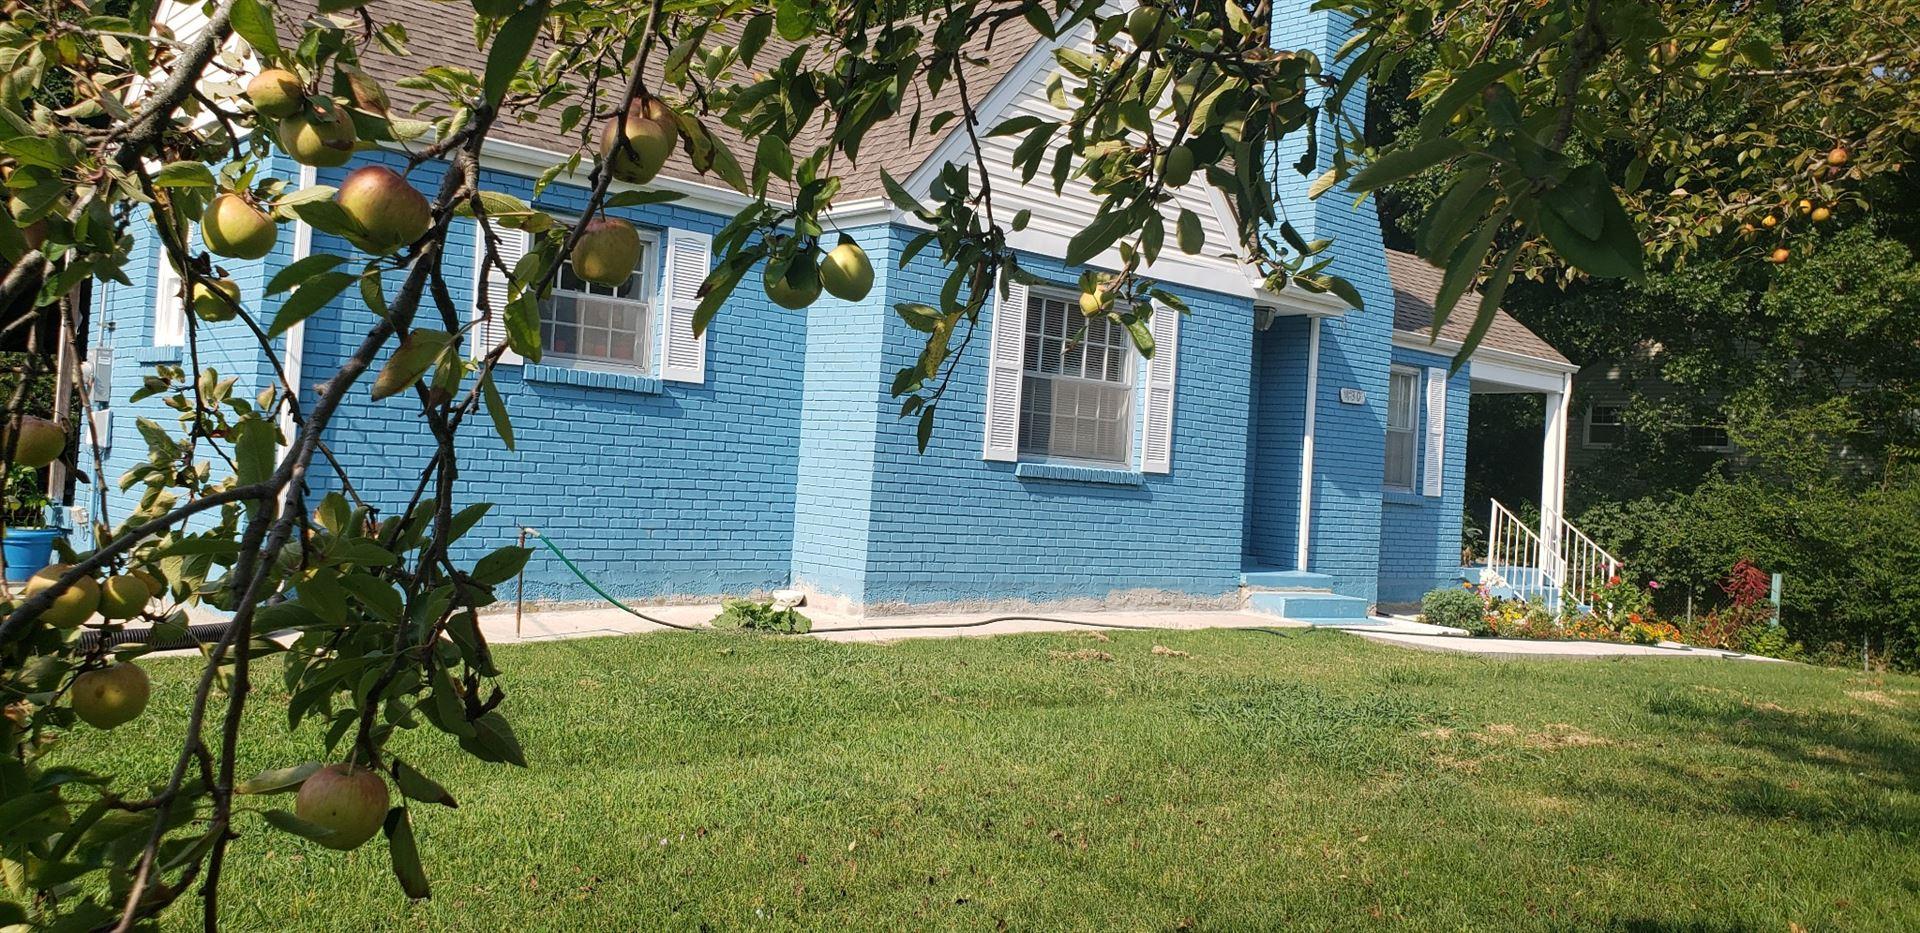 430 W Old Hickory Blvd W, Madison, TN 37115 - MLS#: 2296868